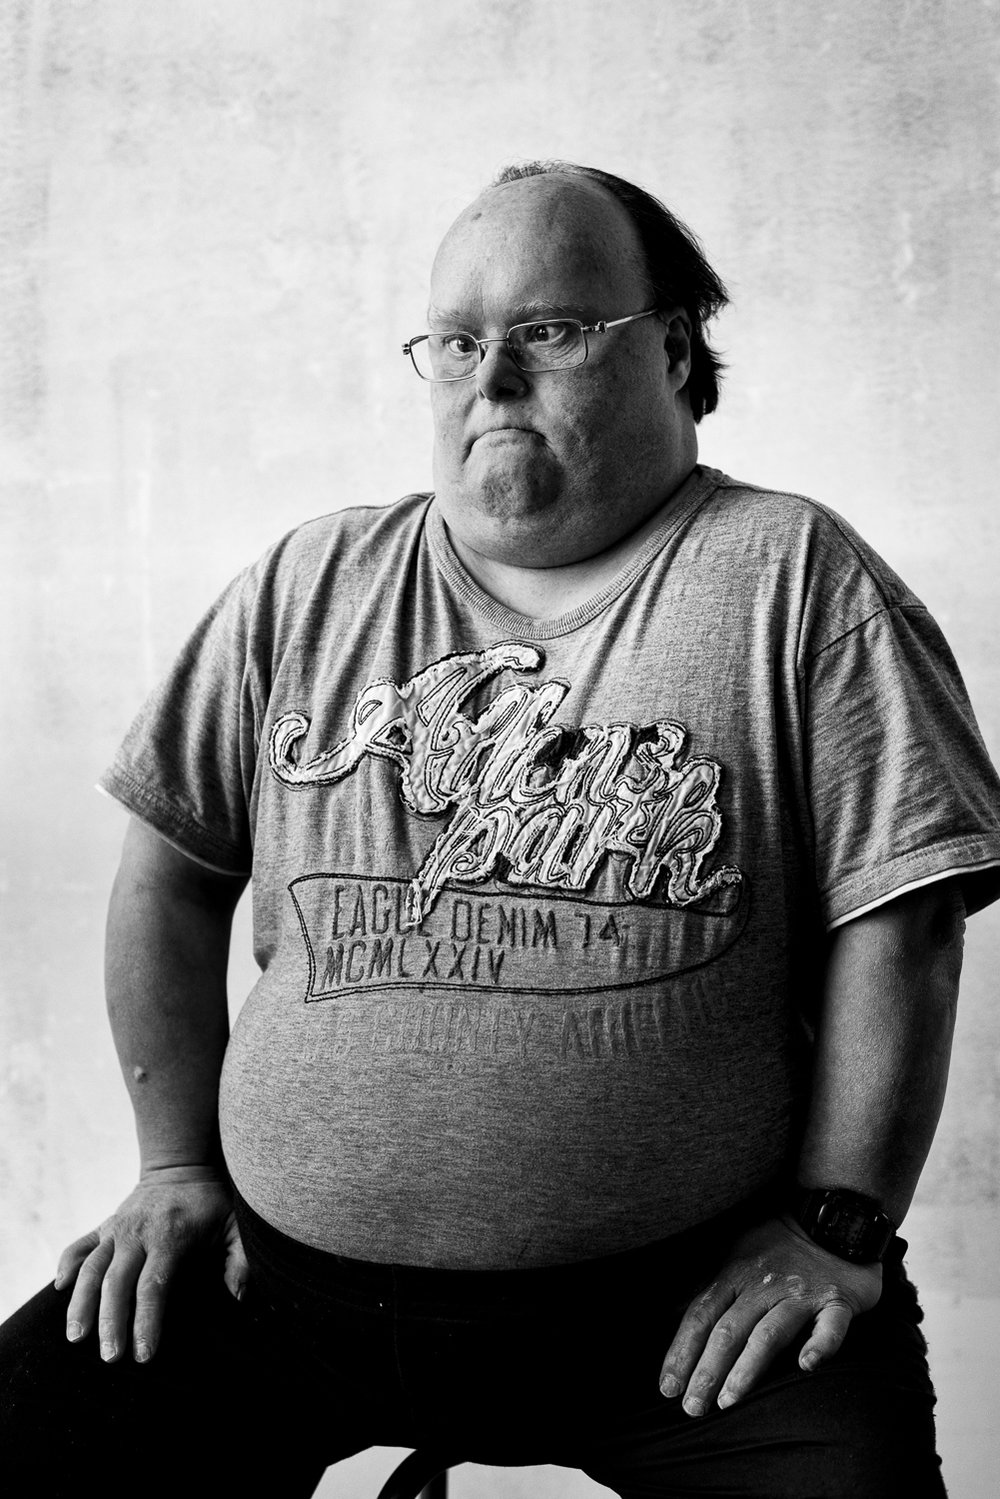 Martin Gomersbach